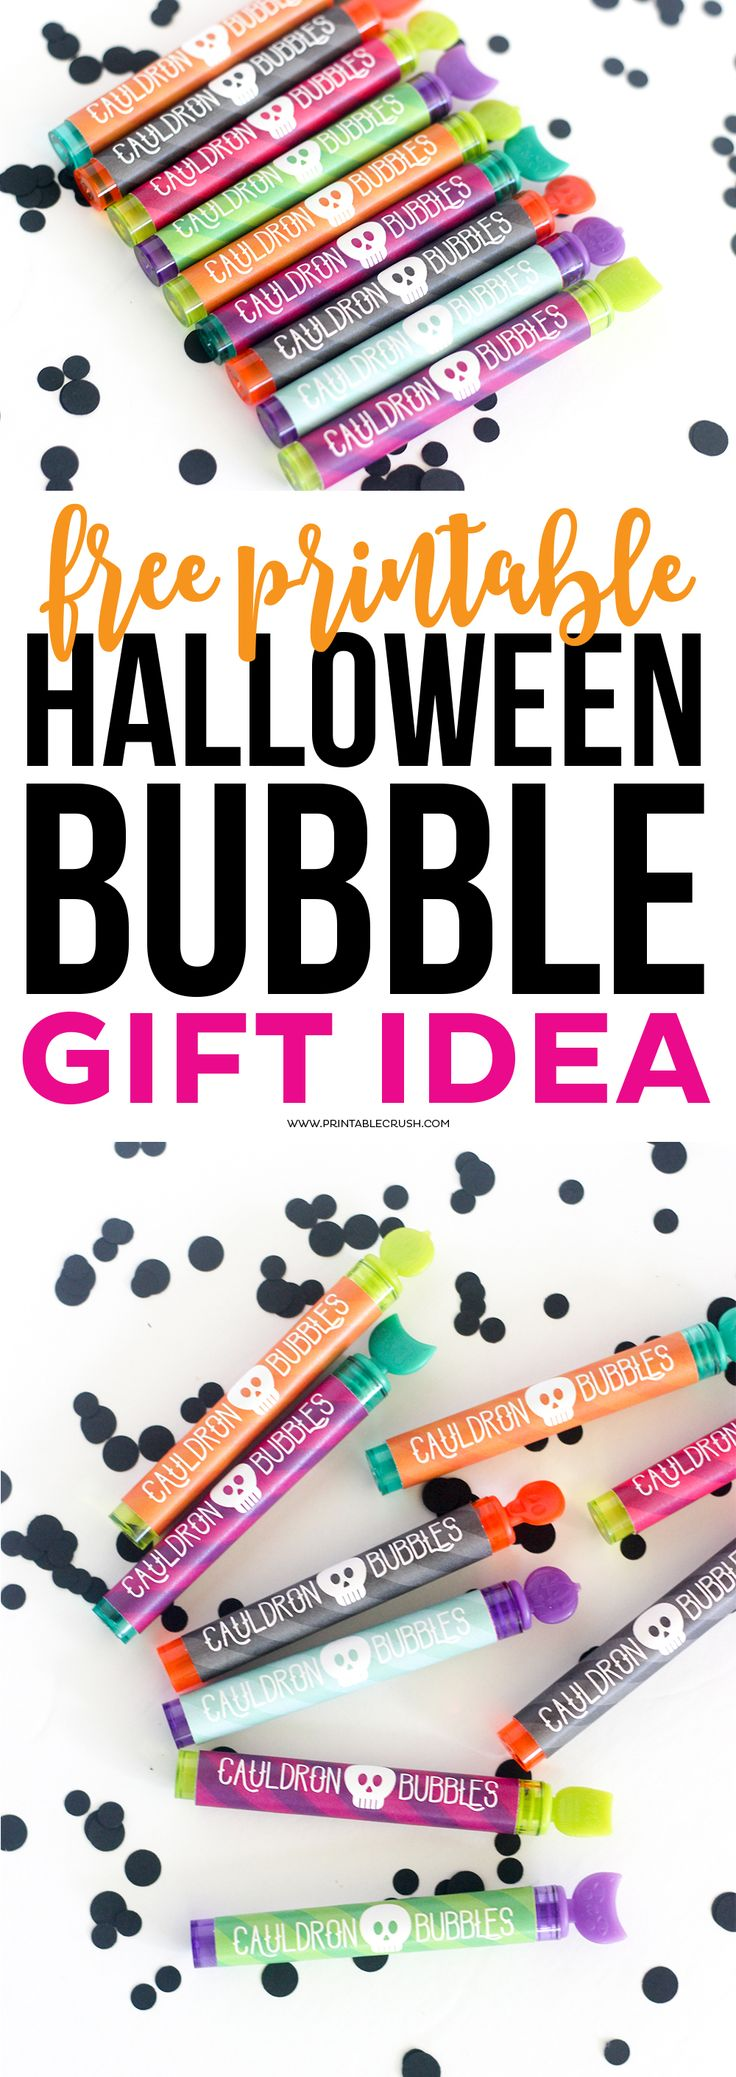 751 best images about Halloween on Pinterest | Halloween ideas ...